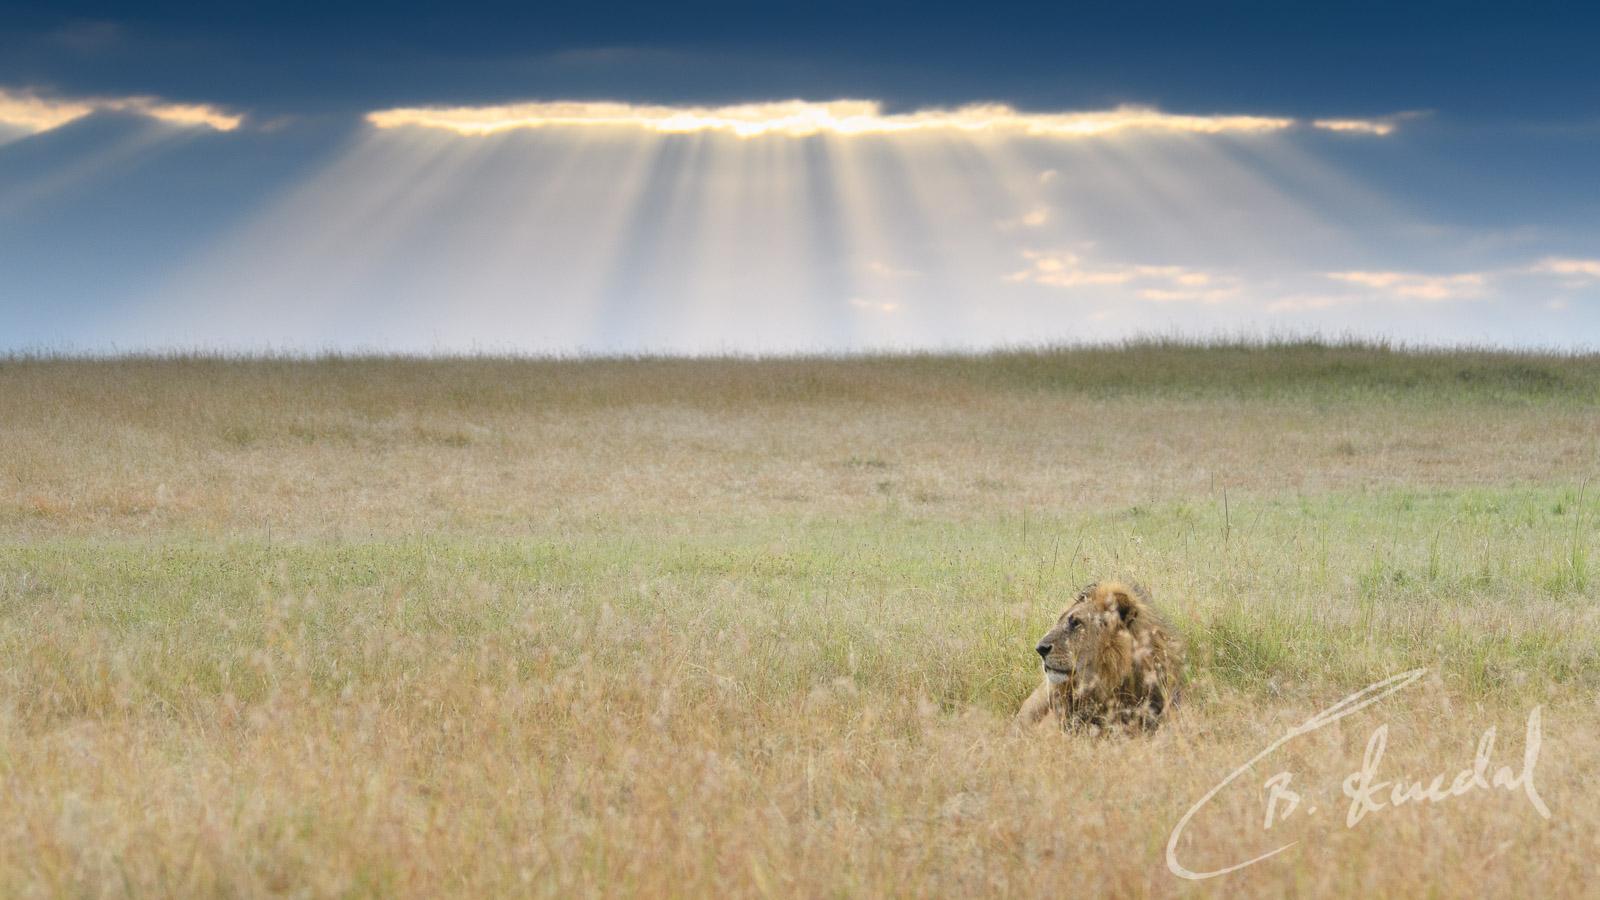 Heavenly lion